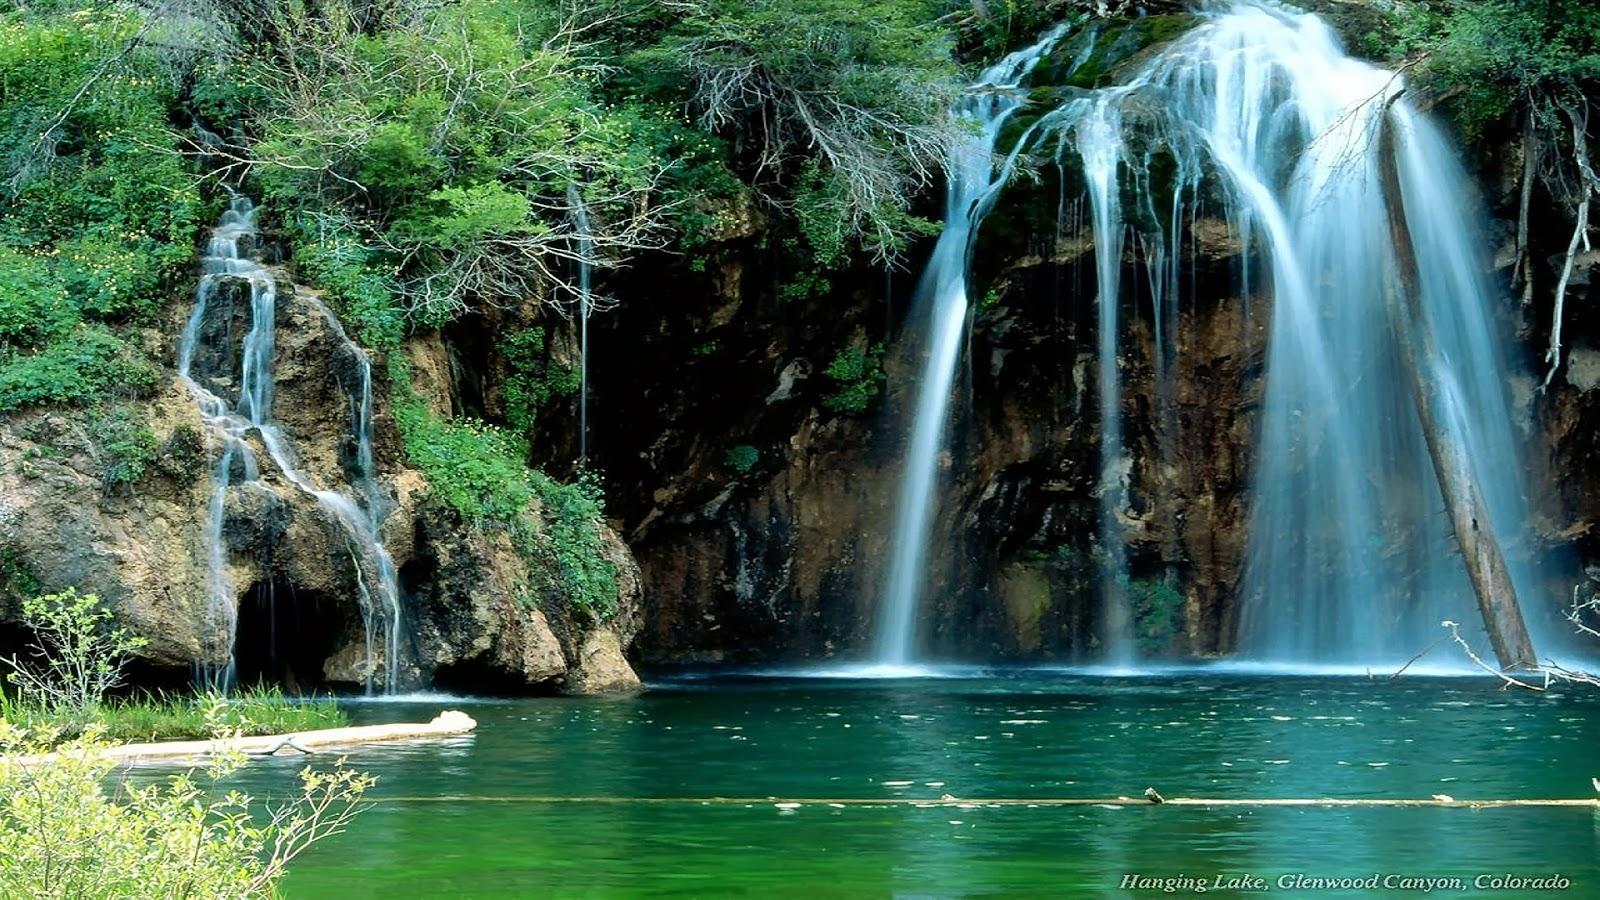 Waterfalls Wallpapers 1080p: HD WALLPAPERS: Download 1080p Wallpaper